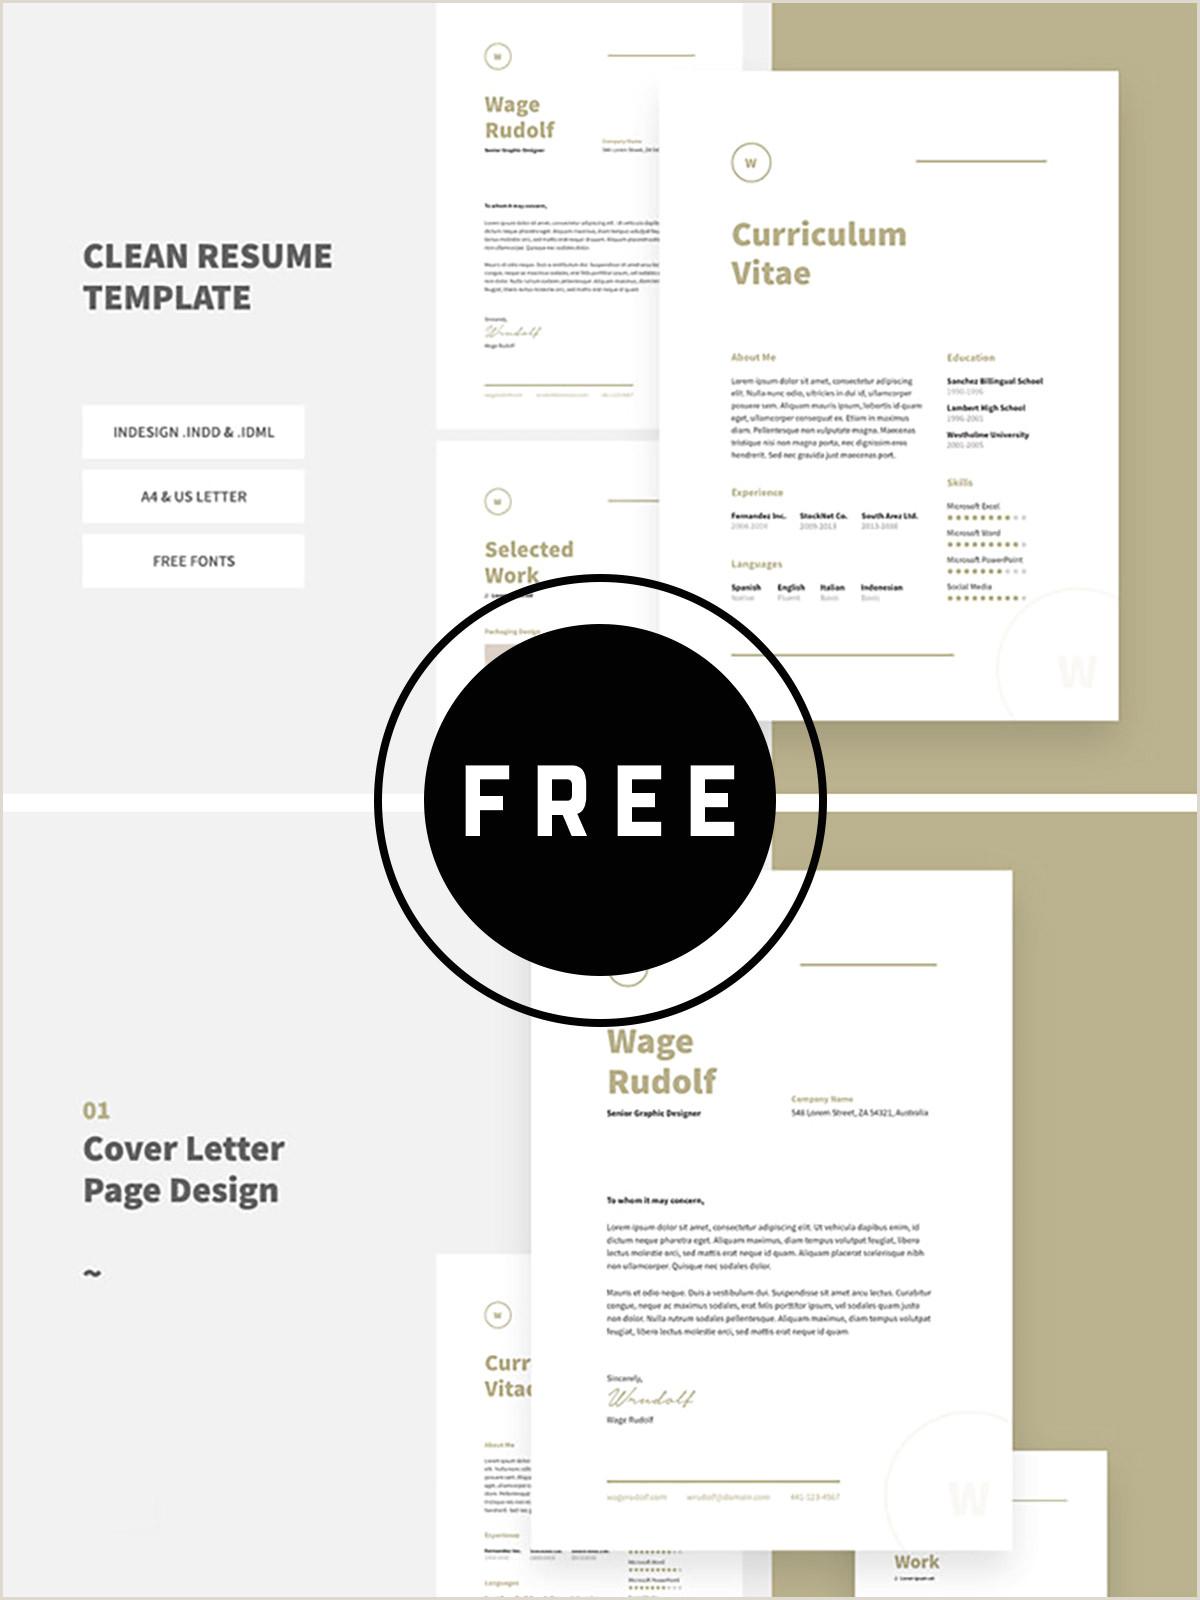 98 Awesome Free Resume Templates for 2019 Creativetacos